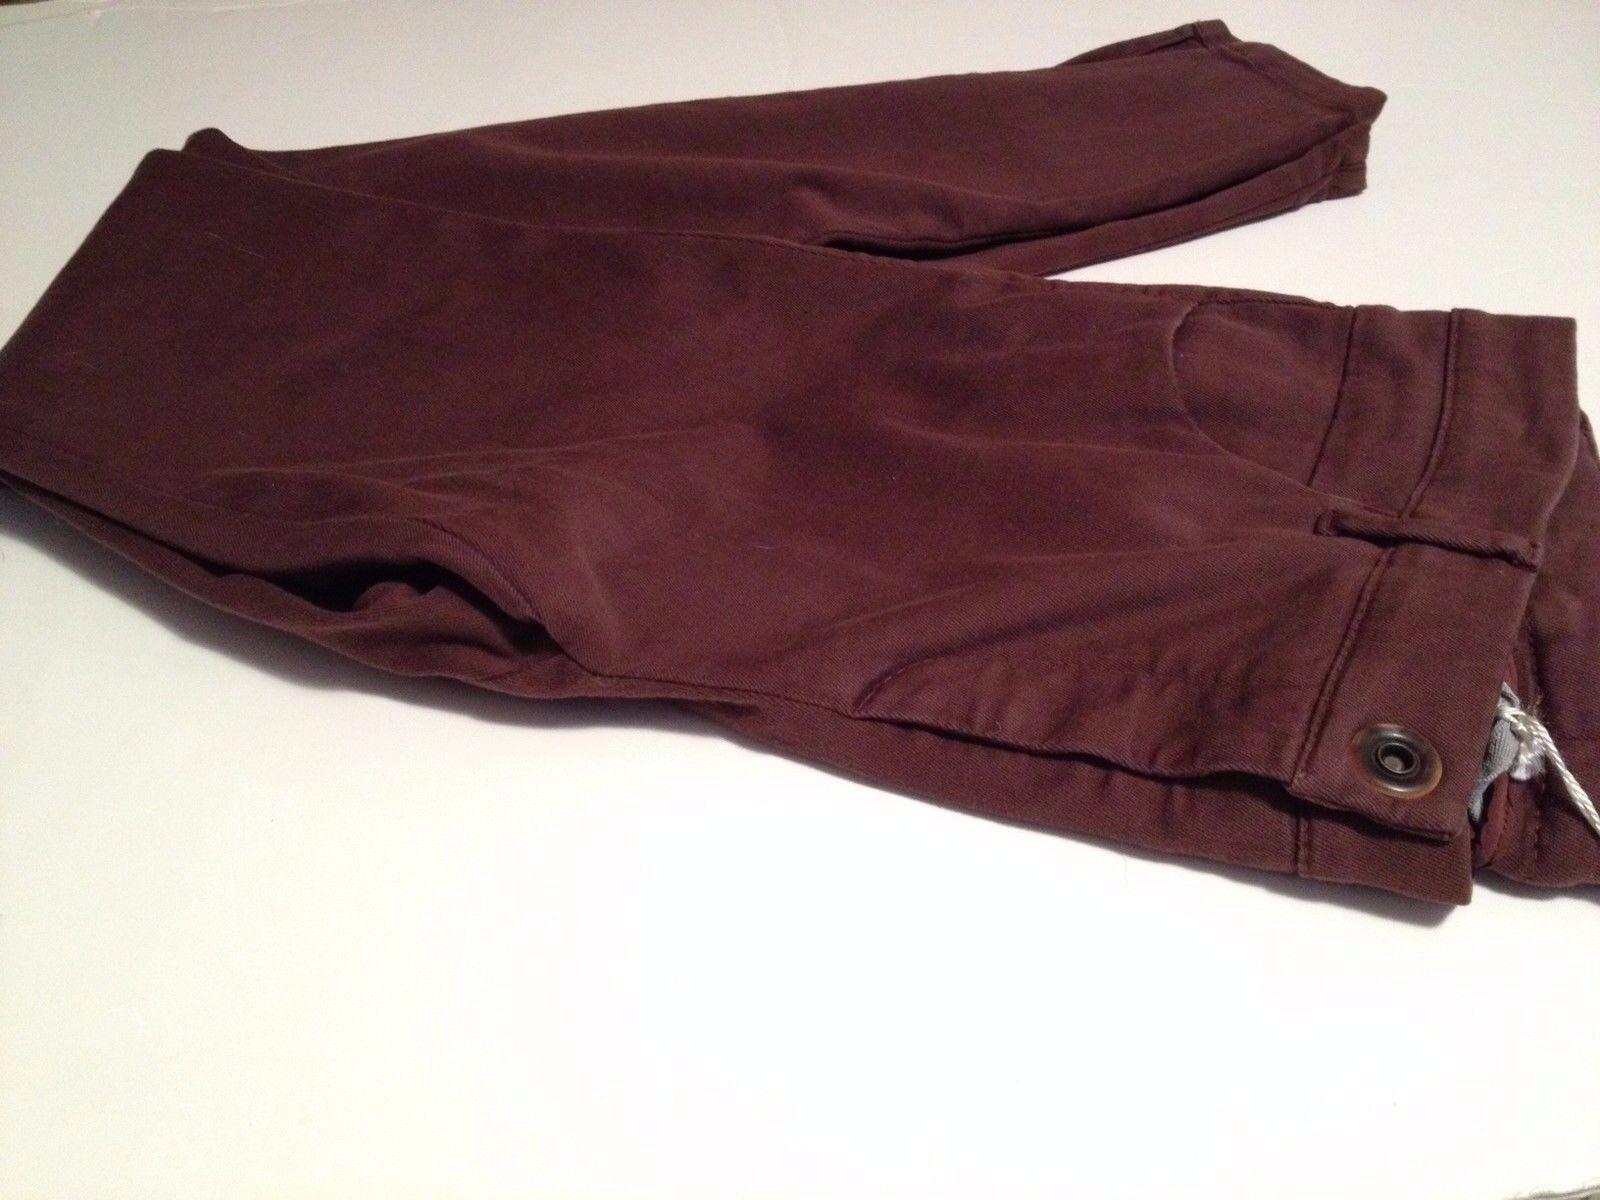 NWT Brunello Cucinelli Cotton Spandex  braun Skinny Jeans Pants  sz 10 FS